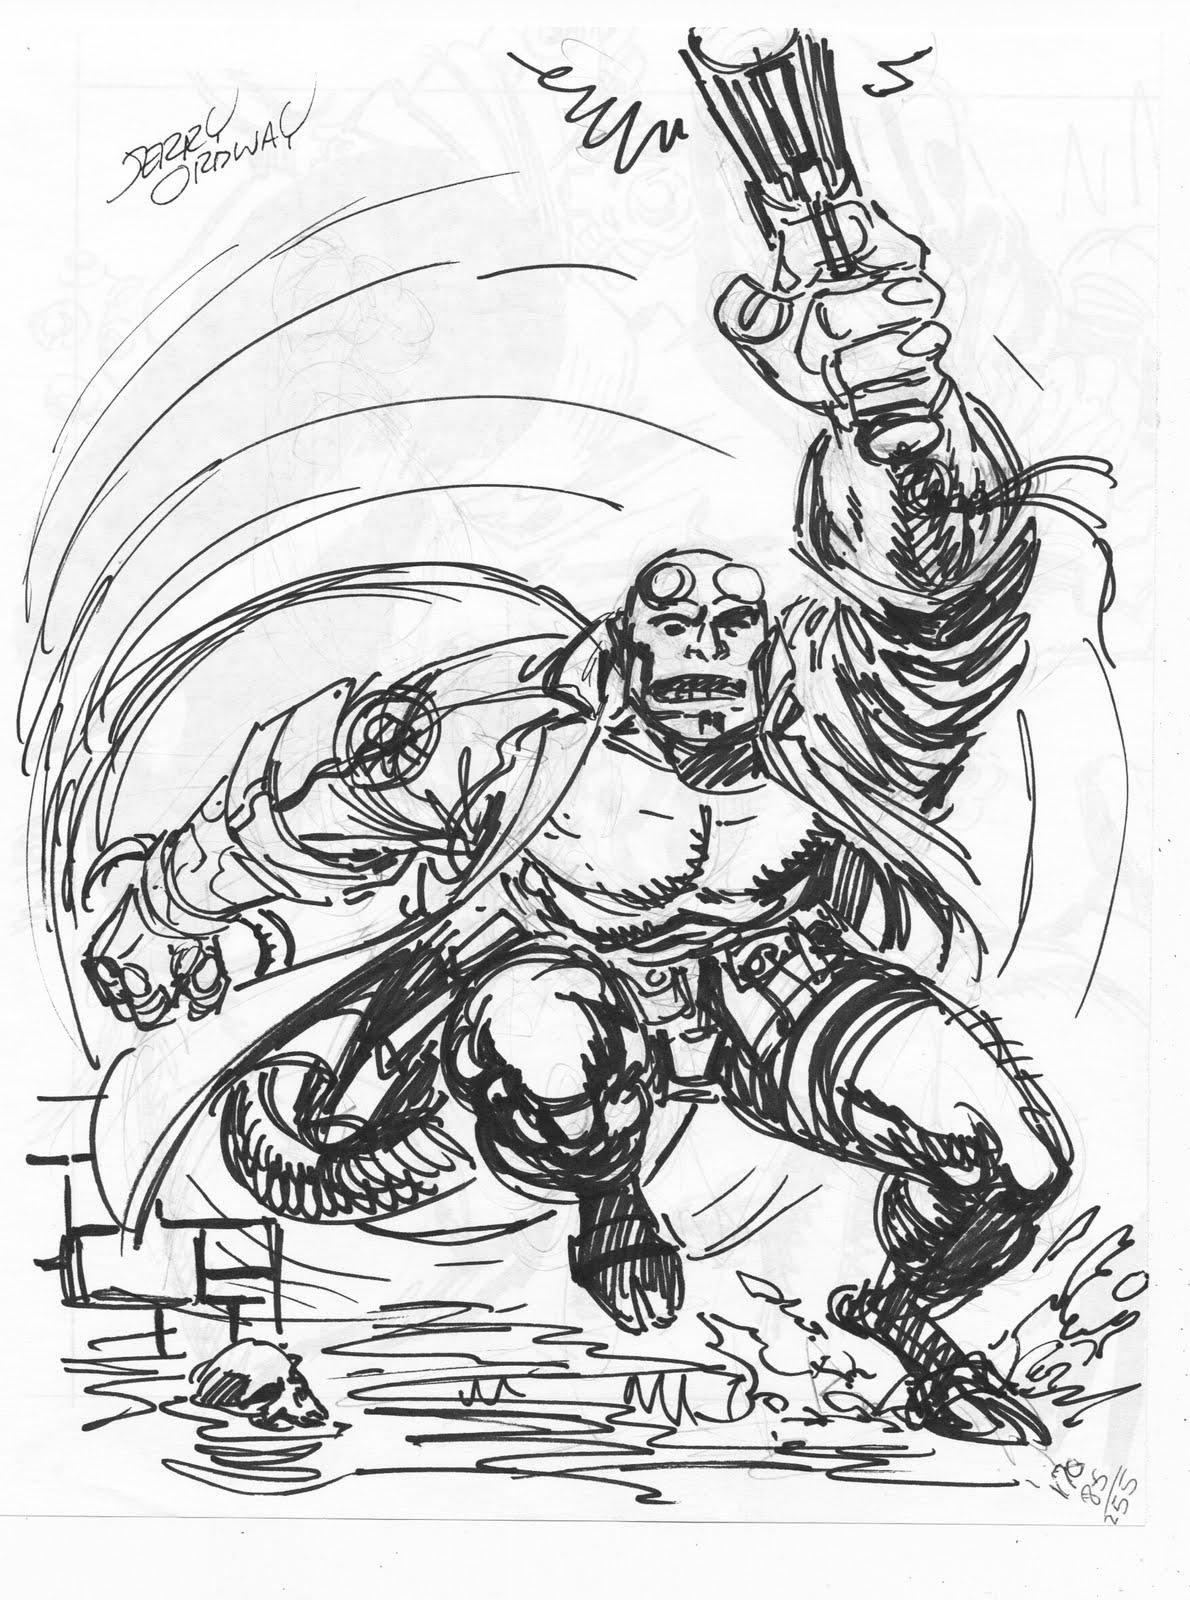 hellboy coloring pages - ordster 39 s random thoughts hellboy prelim